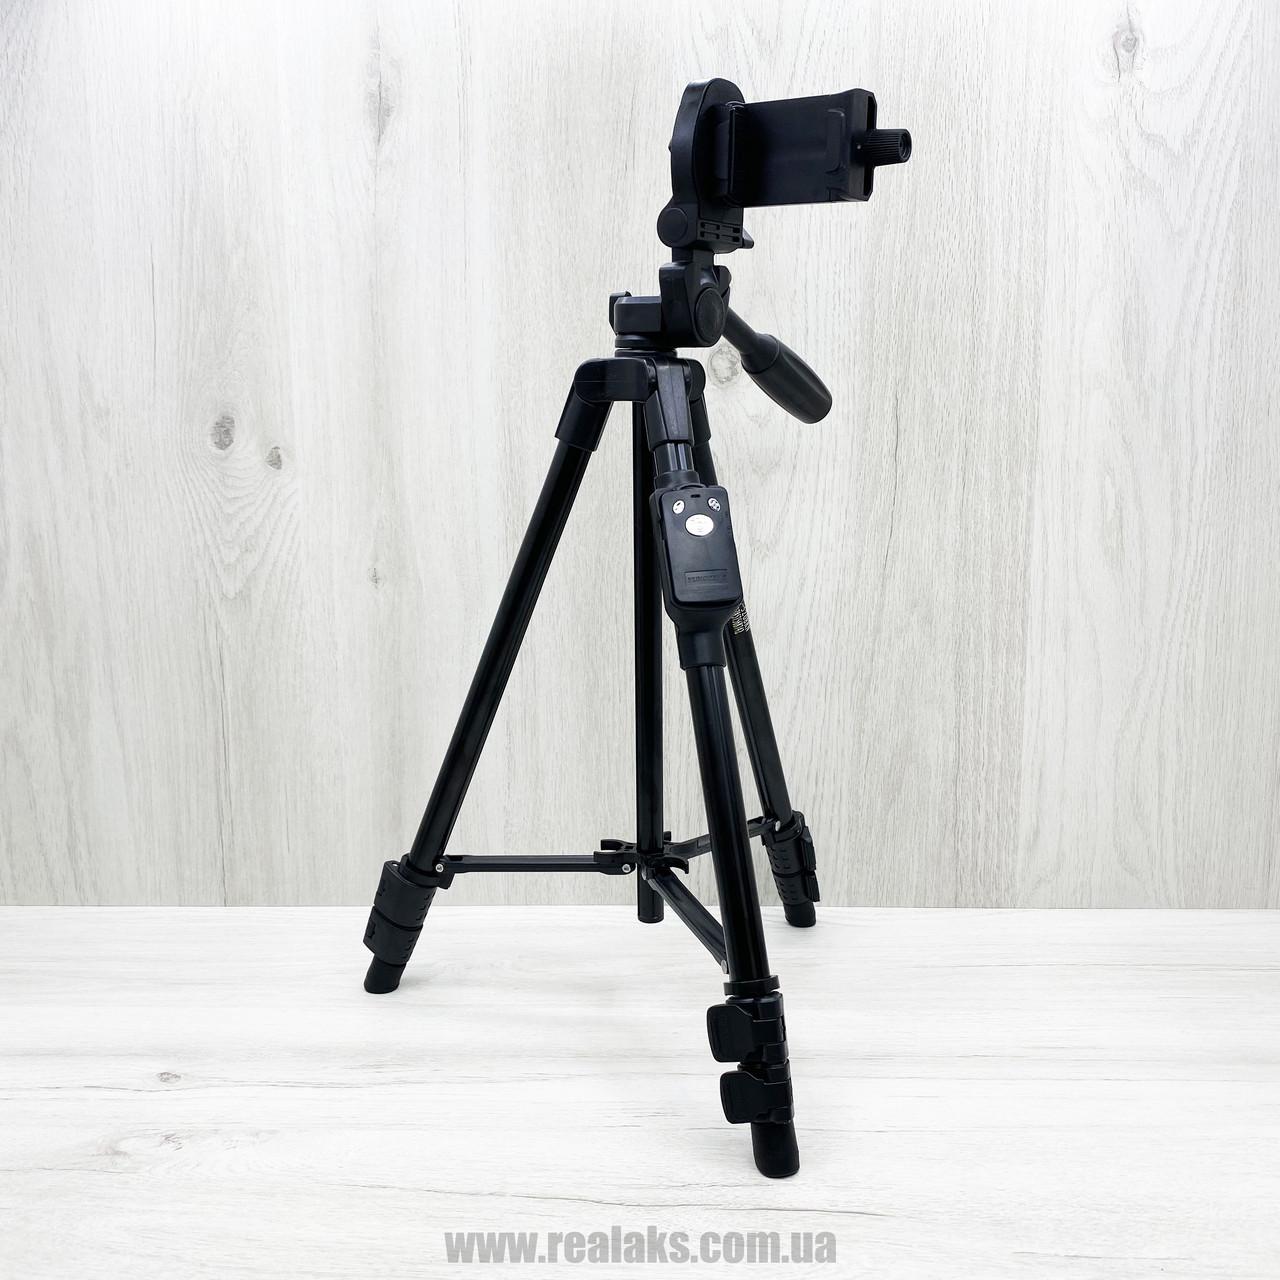 Штатив для телефону фотоапарата YUNTENG VCT 5208 (Black)